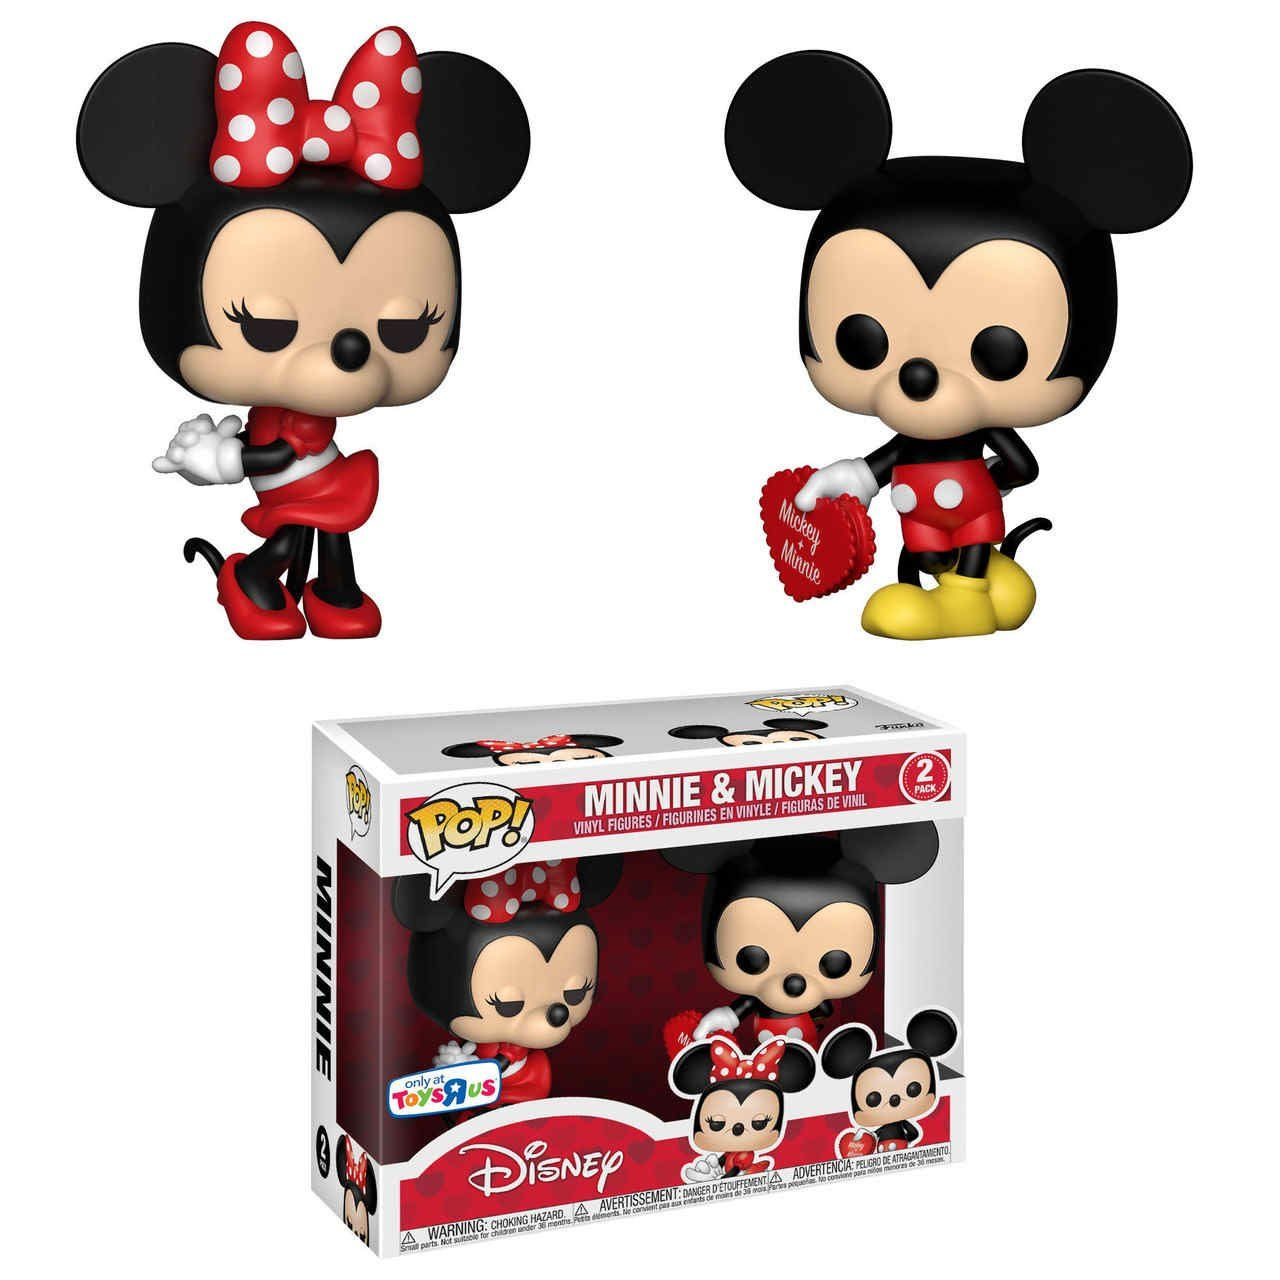 Pop! Pack Mickey e Minnie: Disney (Exclusivo) #02 - Funko